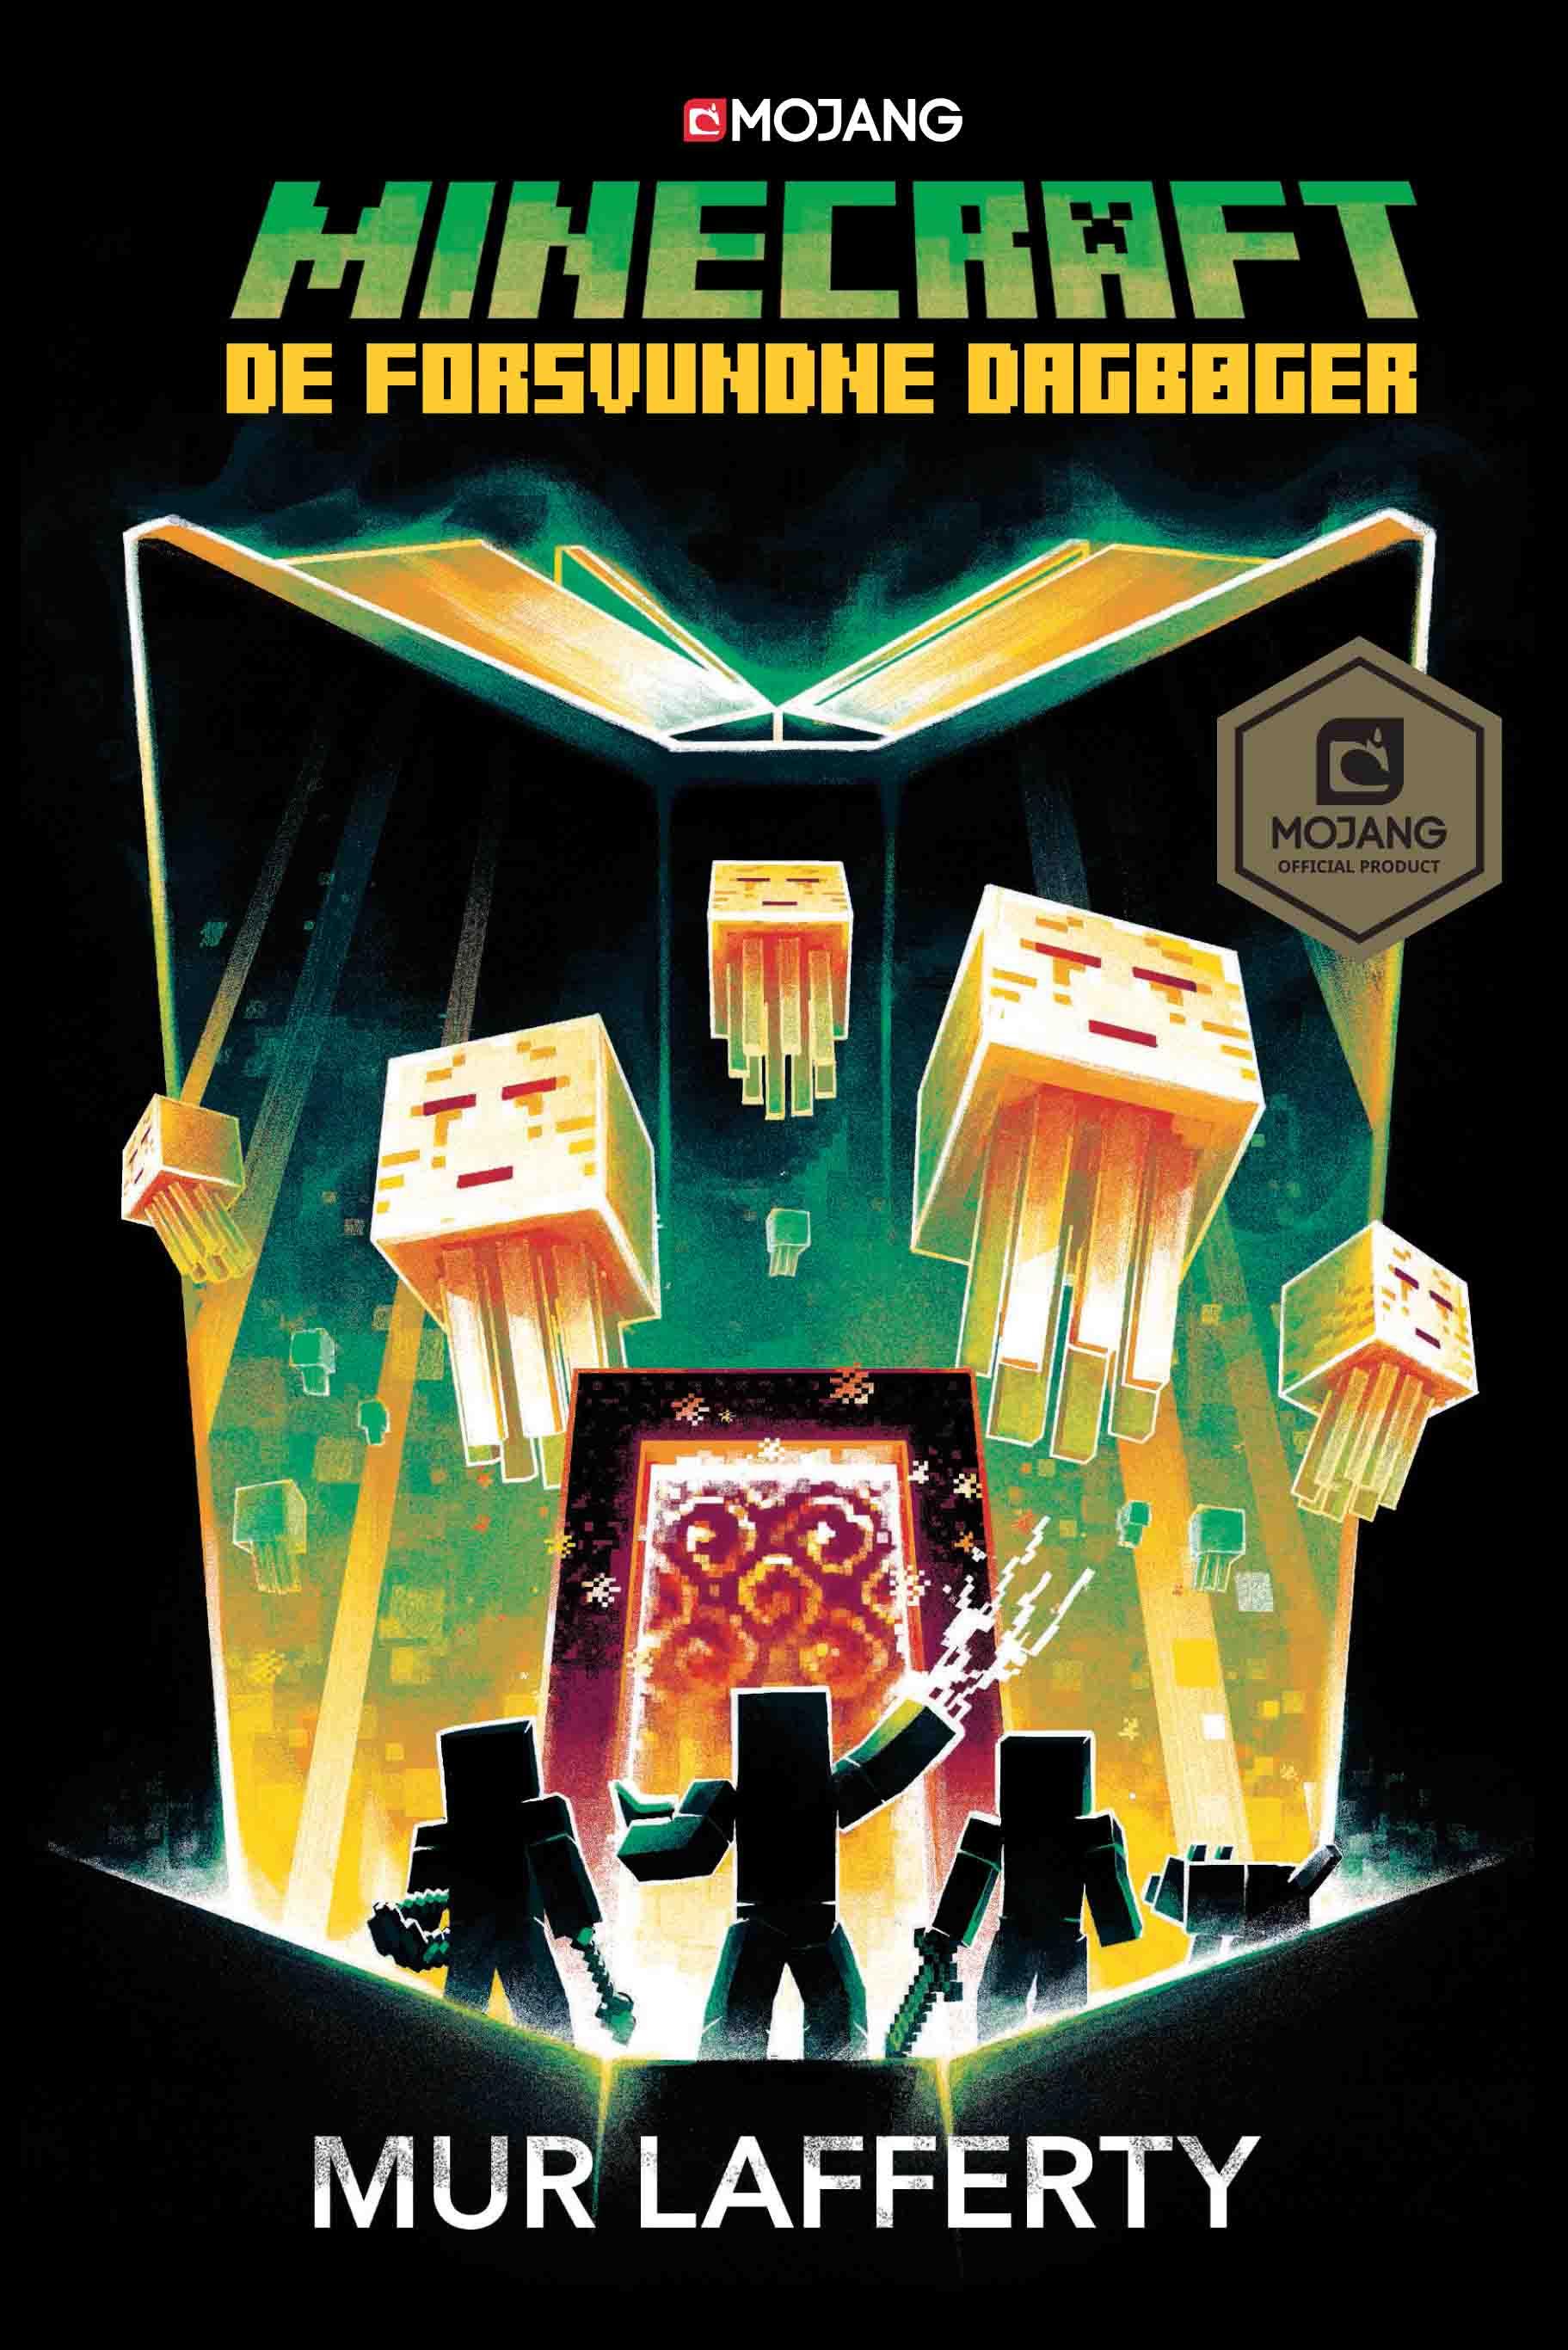 Minecraft: Minecraft - De forsvundne dagbøger - Mur Lafferty - Bøger - Politikens Forlag - 9788740051599 - 7/11-2019